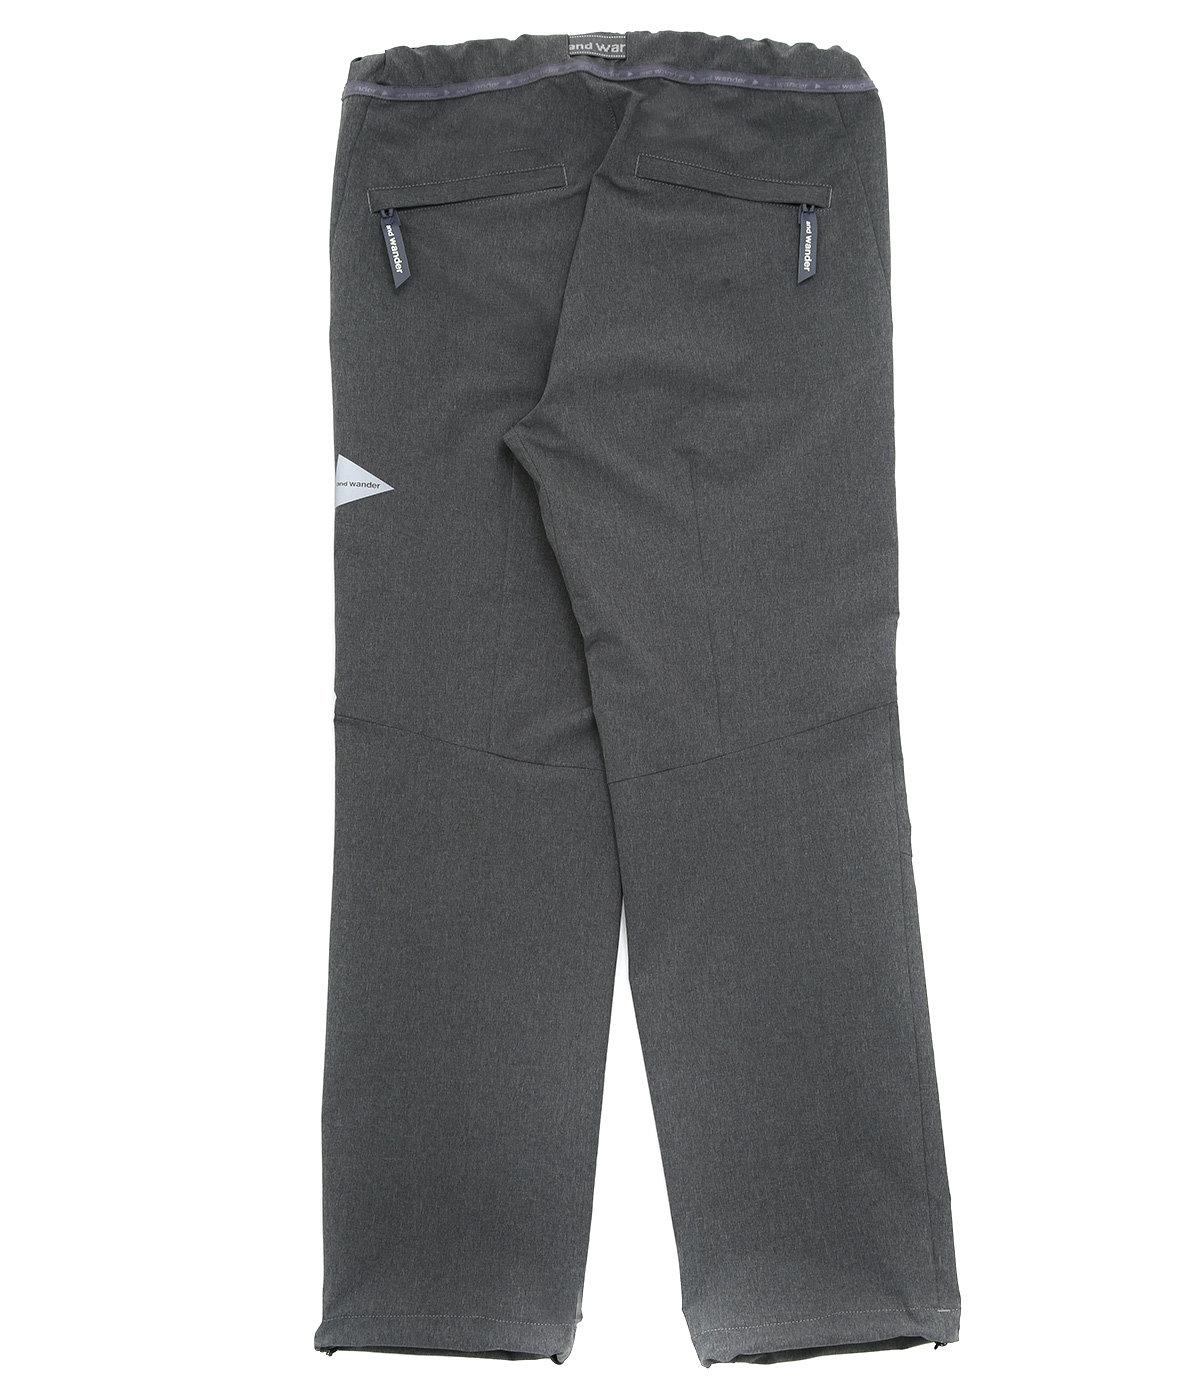 2way stretch long pants